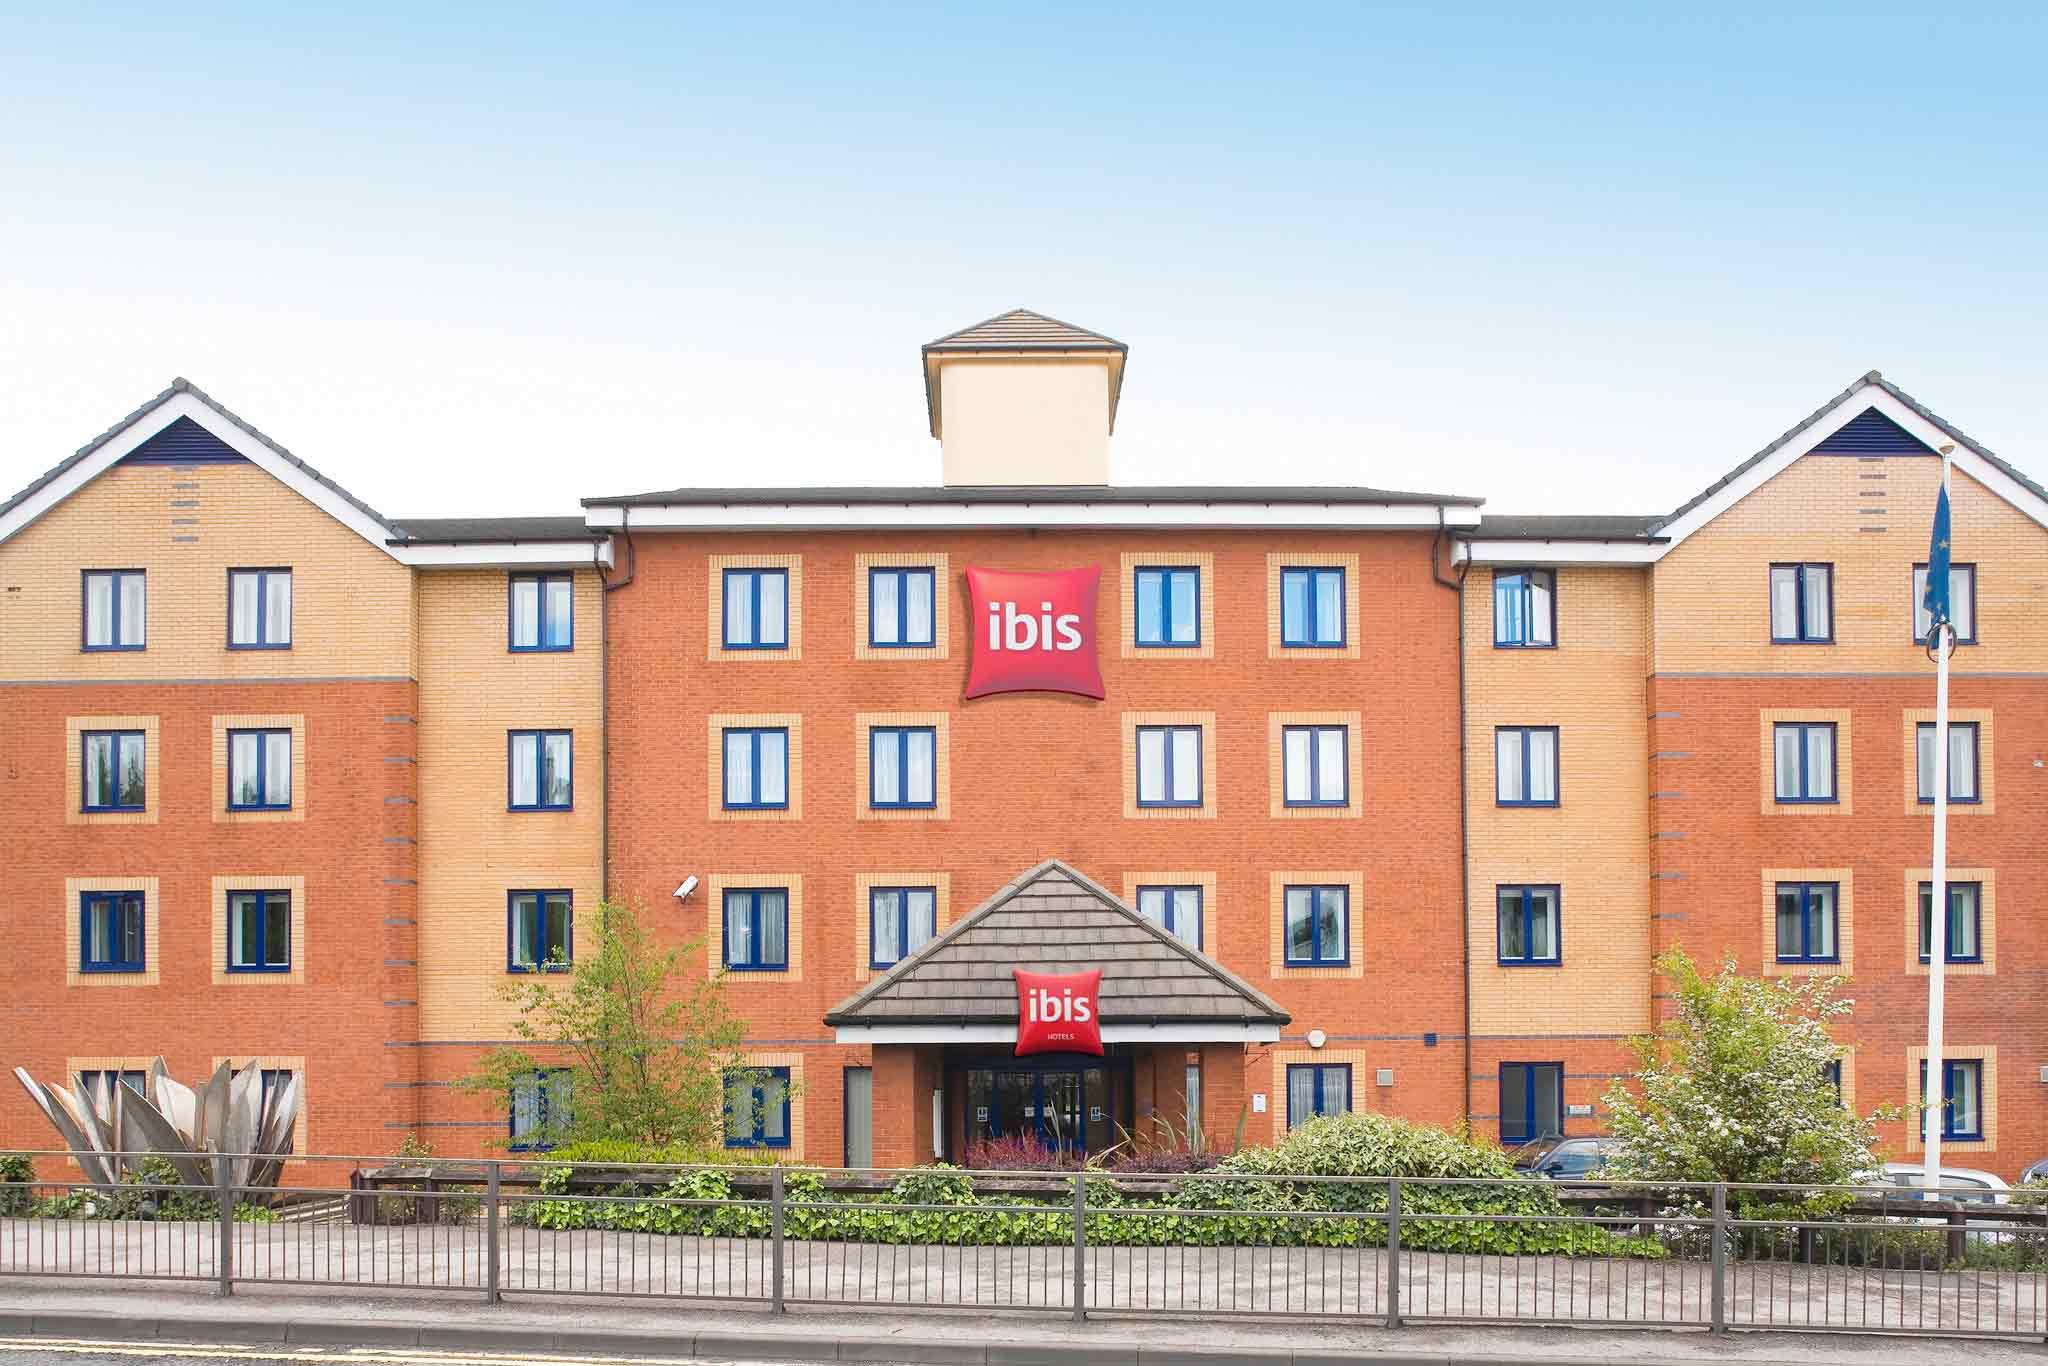 Hotel - ibis Chesterfield Centre - Market Town